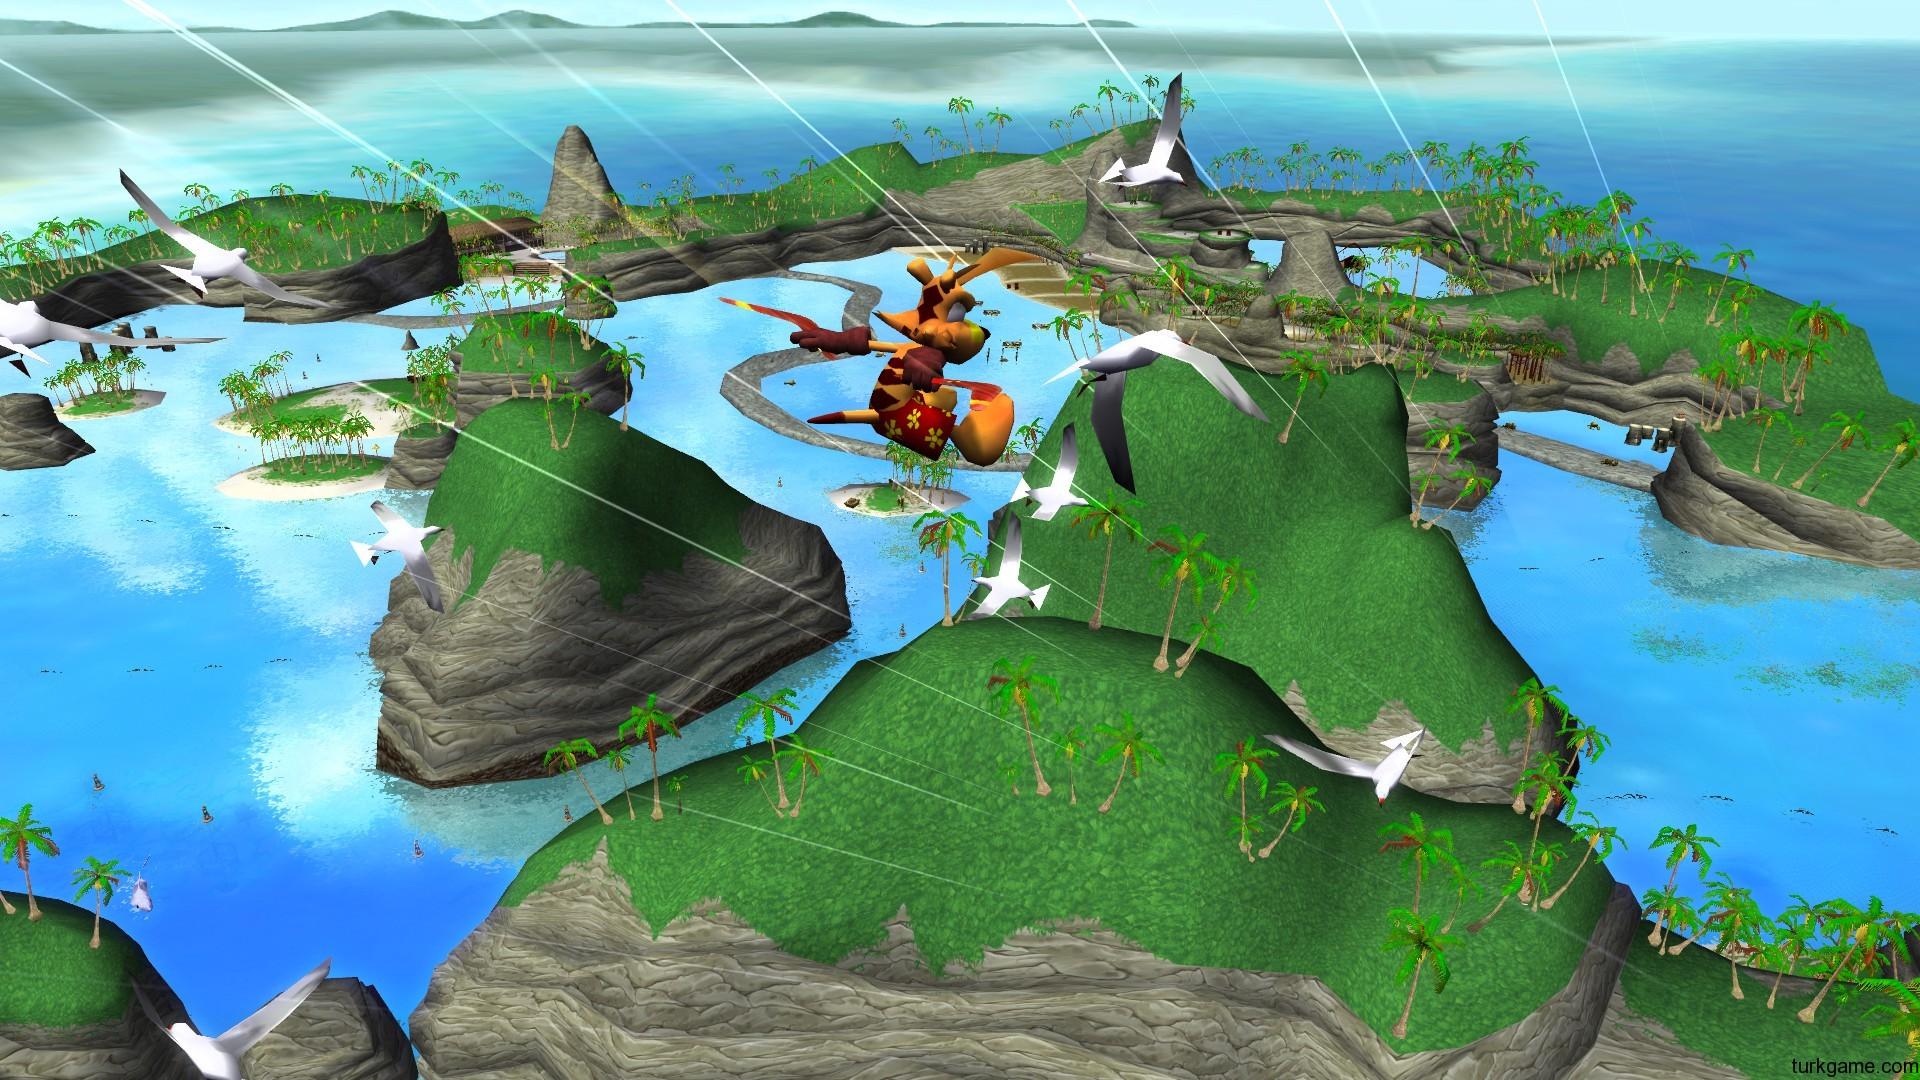 TY-the-Tasmanian-Tiger-Oyun-Performansi-%E2%80%93-Oyun-%C3%96zellikleri-%E2%80%93-Inceleme-https-www-turkgame-wallpaper-wp50013370